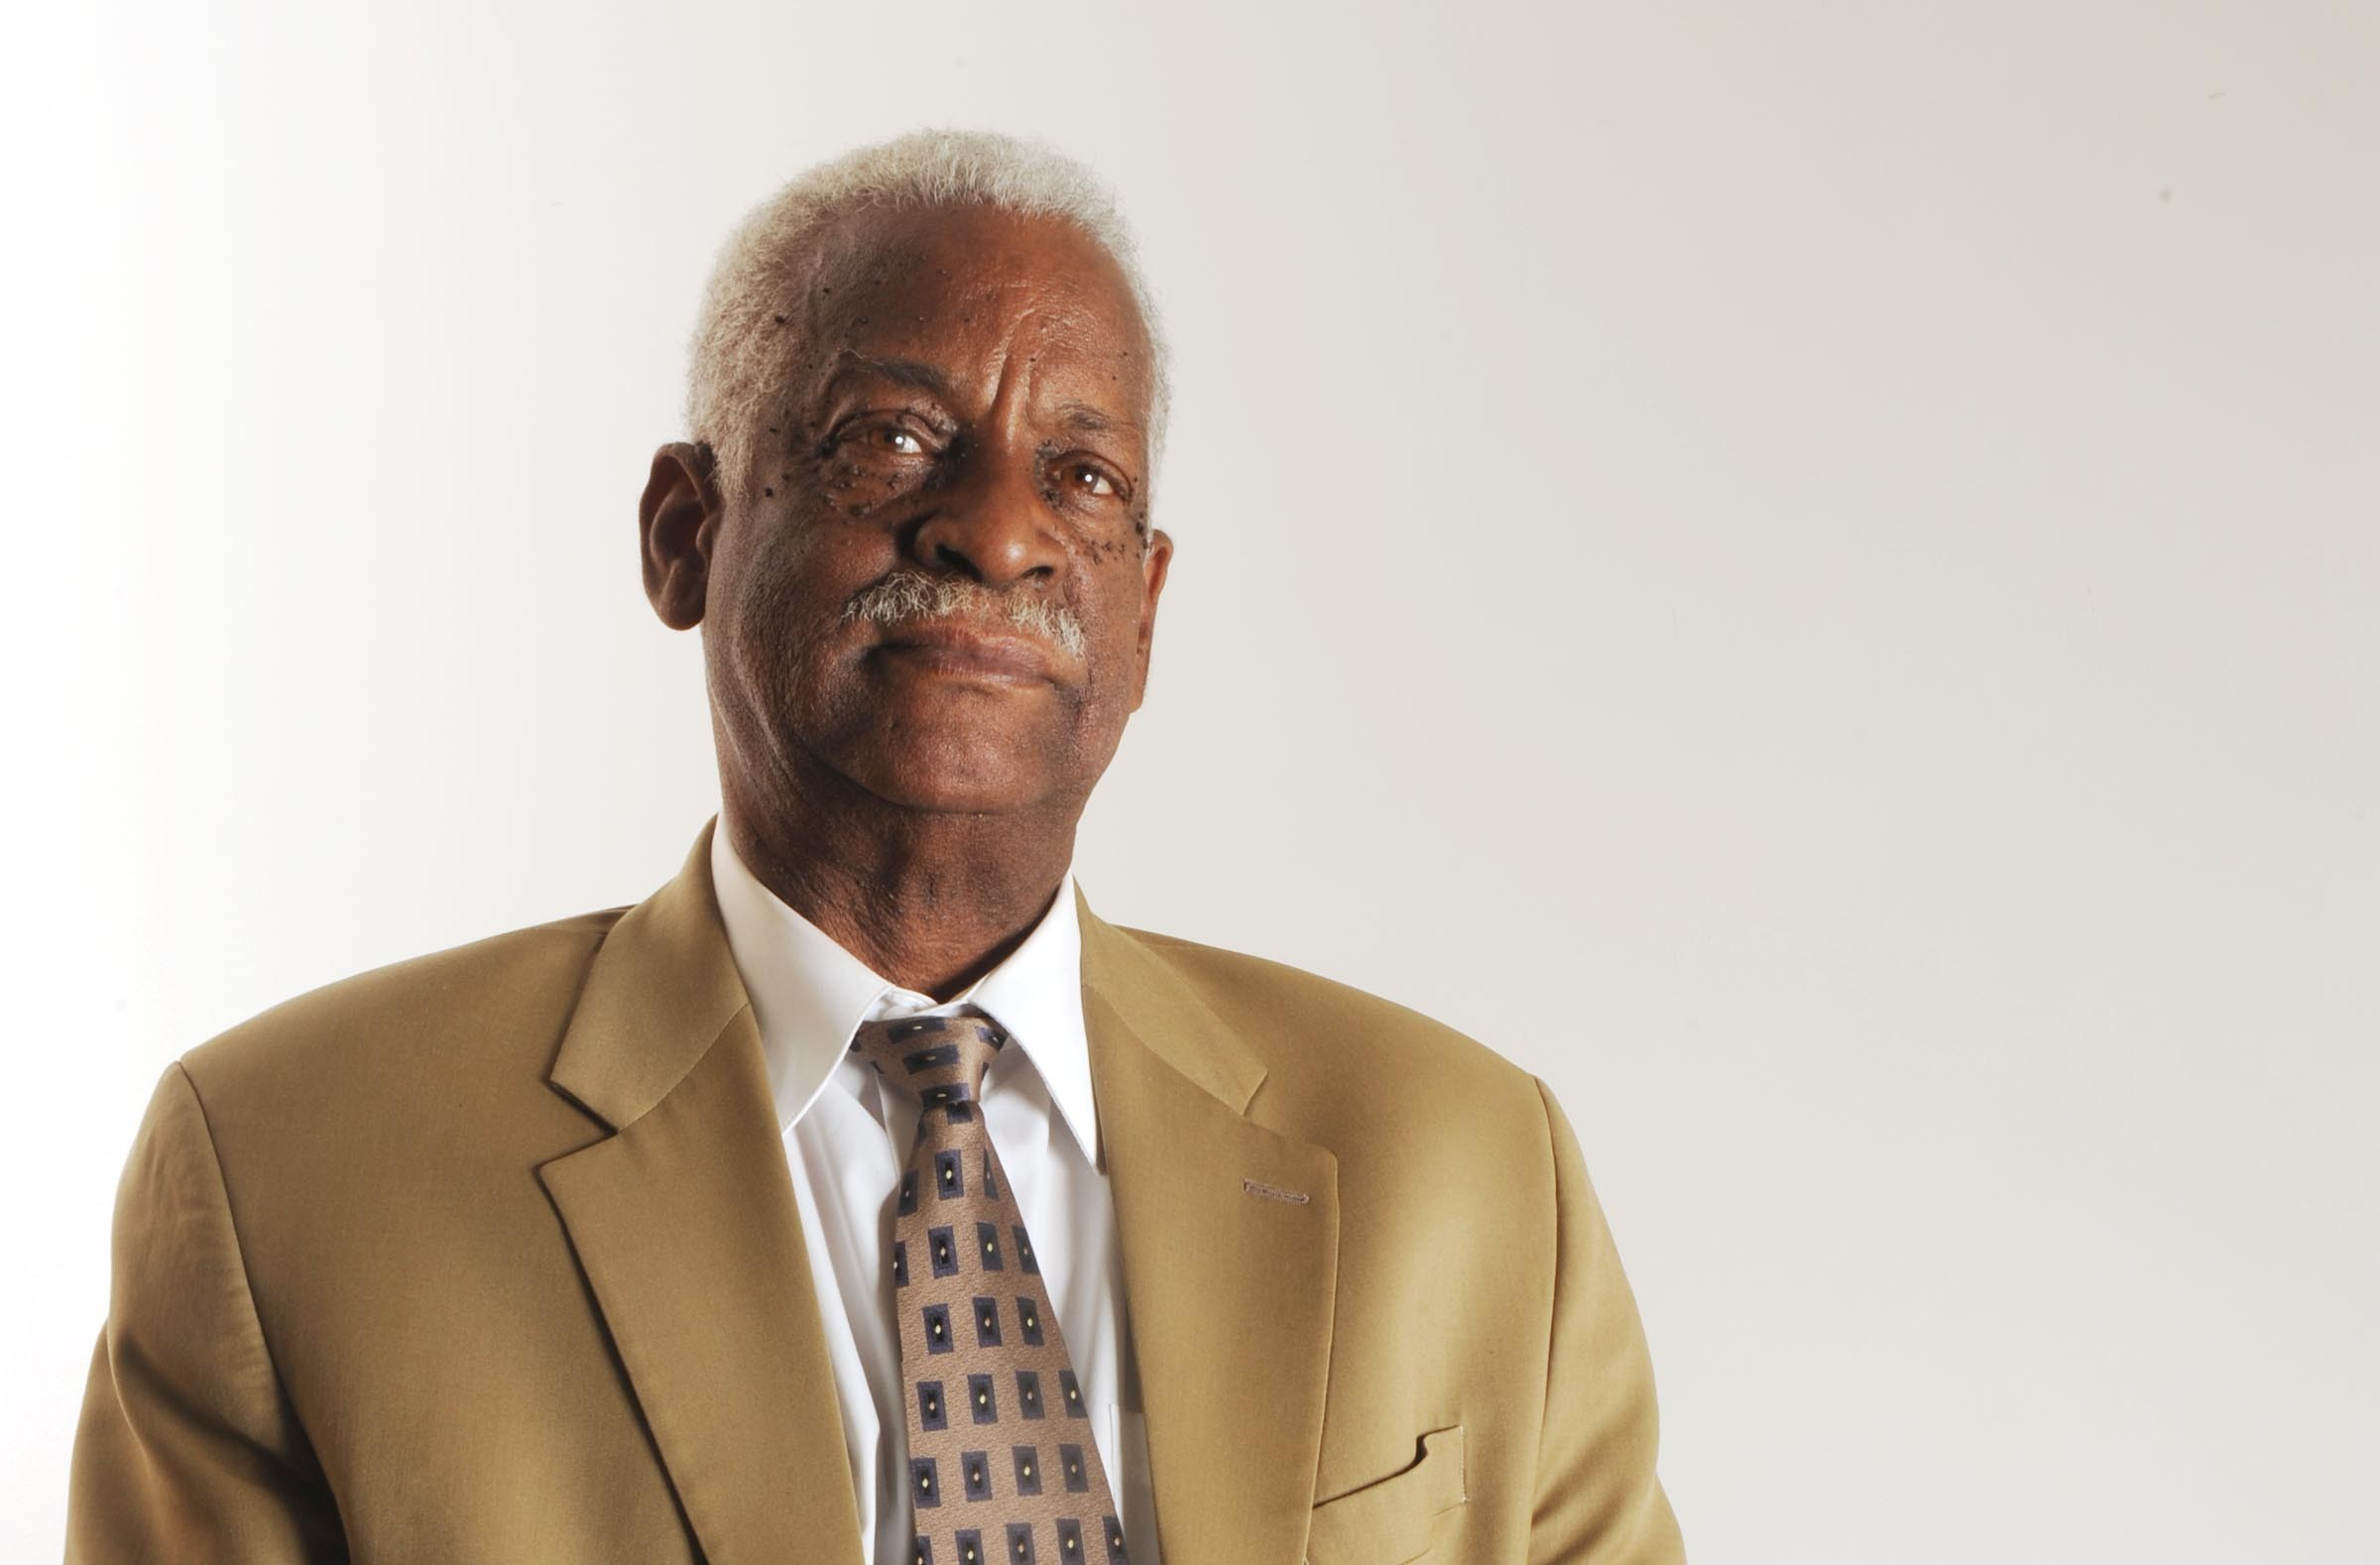 Former City Councilman Marty Jewell. - SCOTT ELMQUIST